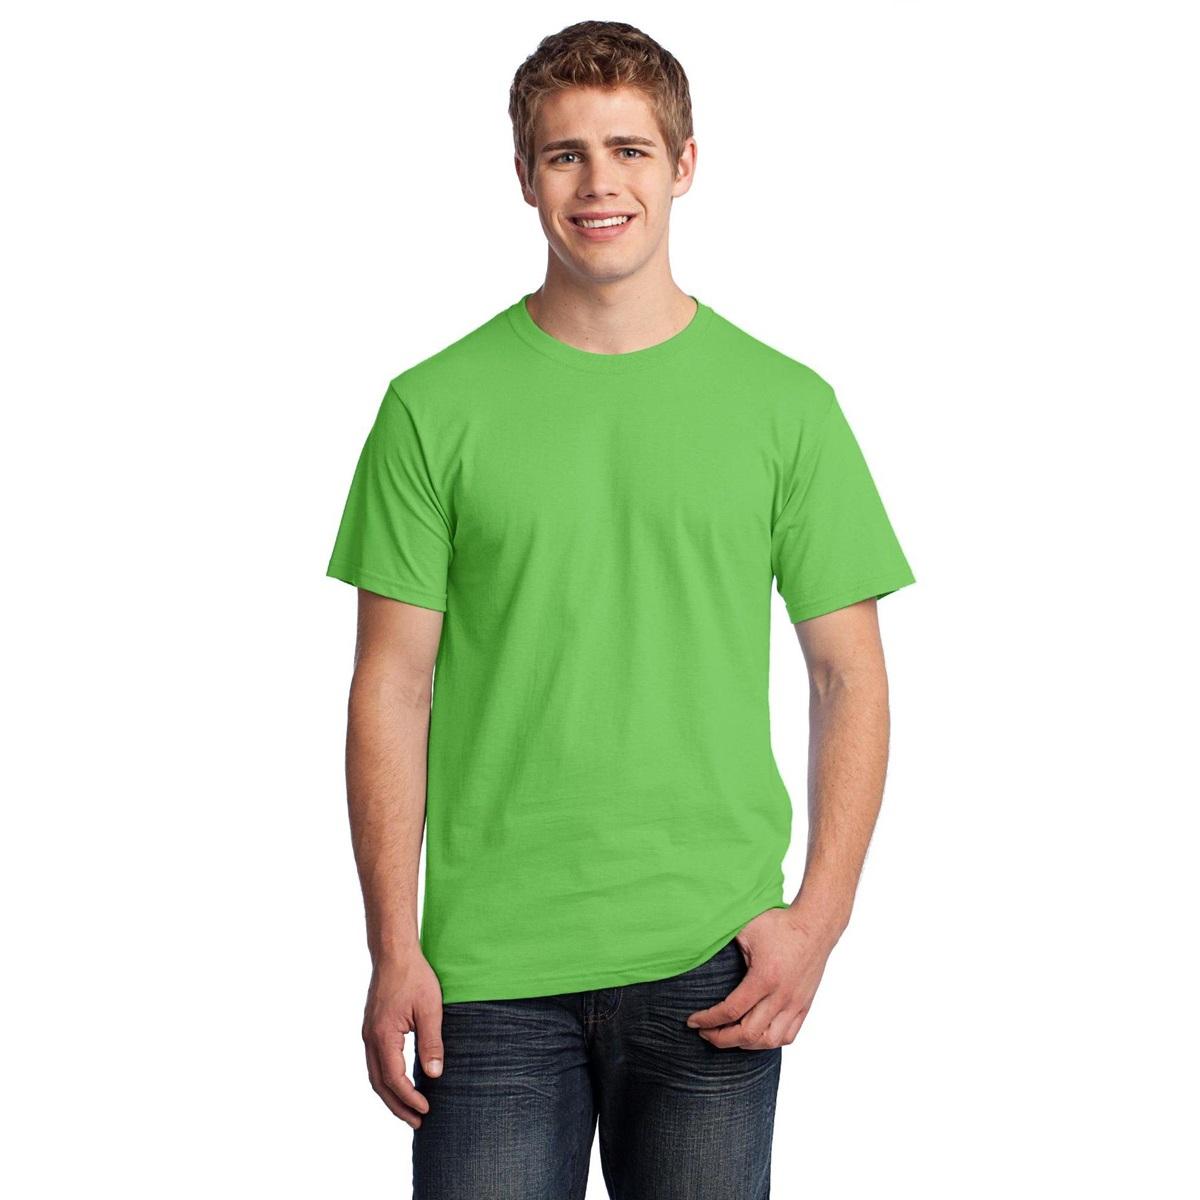 Fruit Of The Loom 3930 Heavy Cotton Hd T Shirt Kiwi